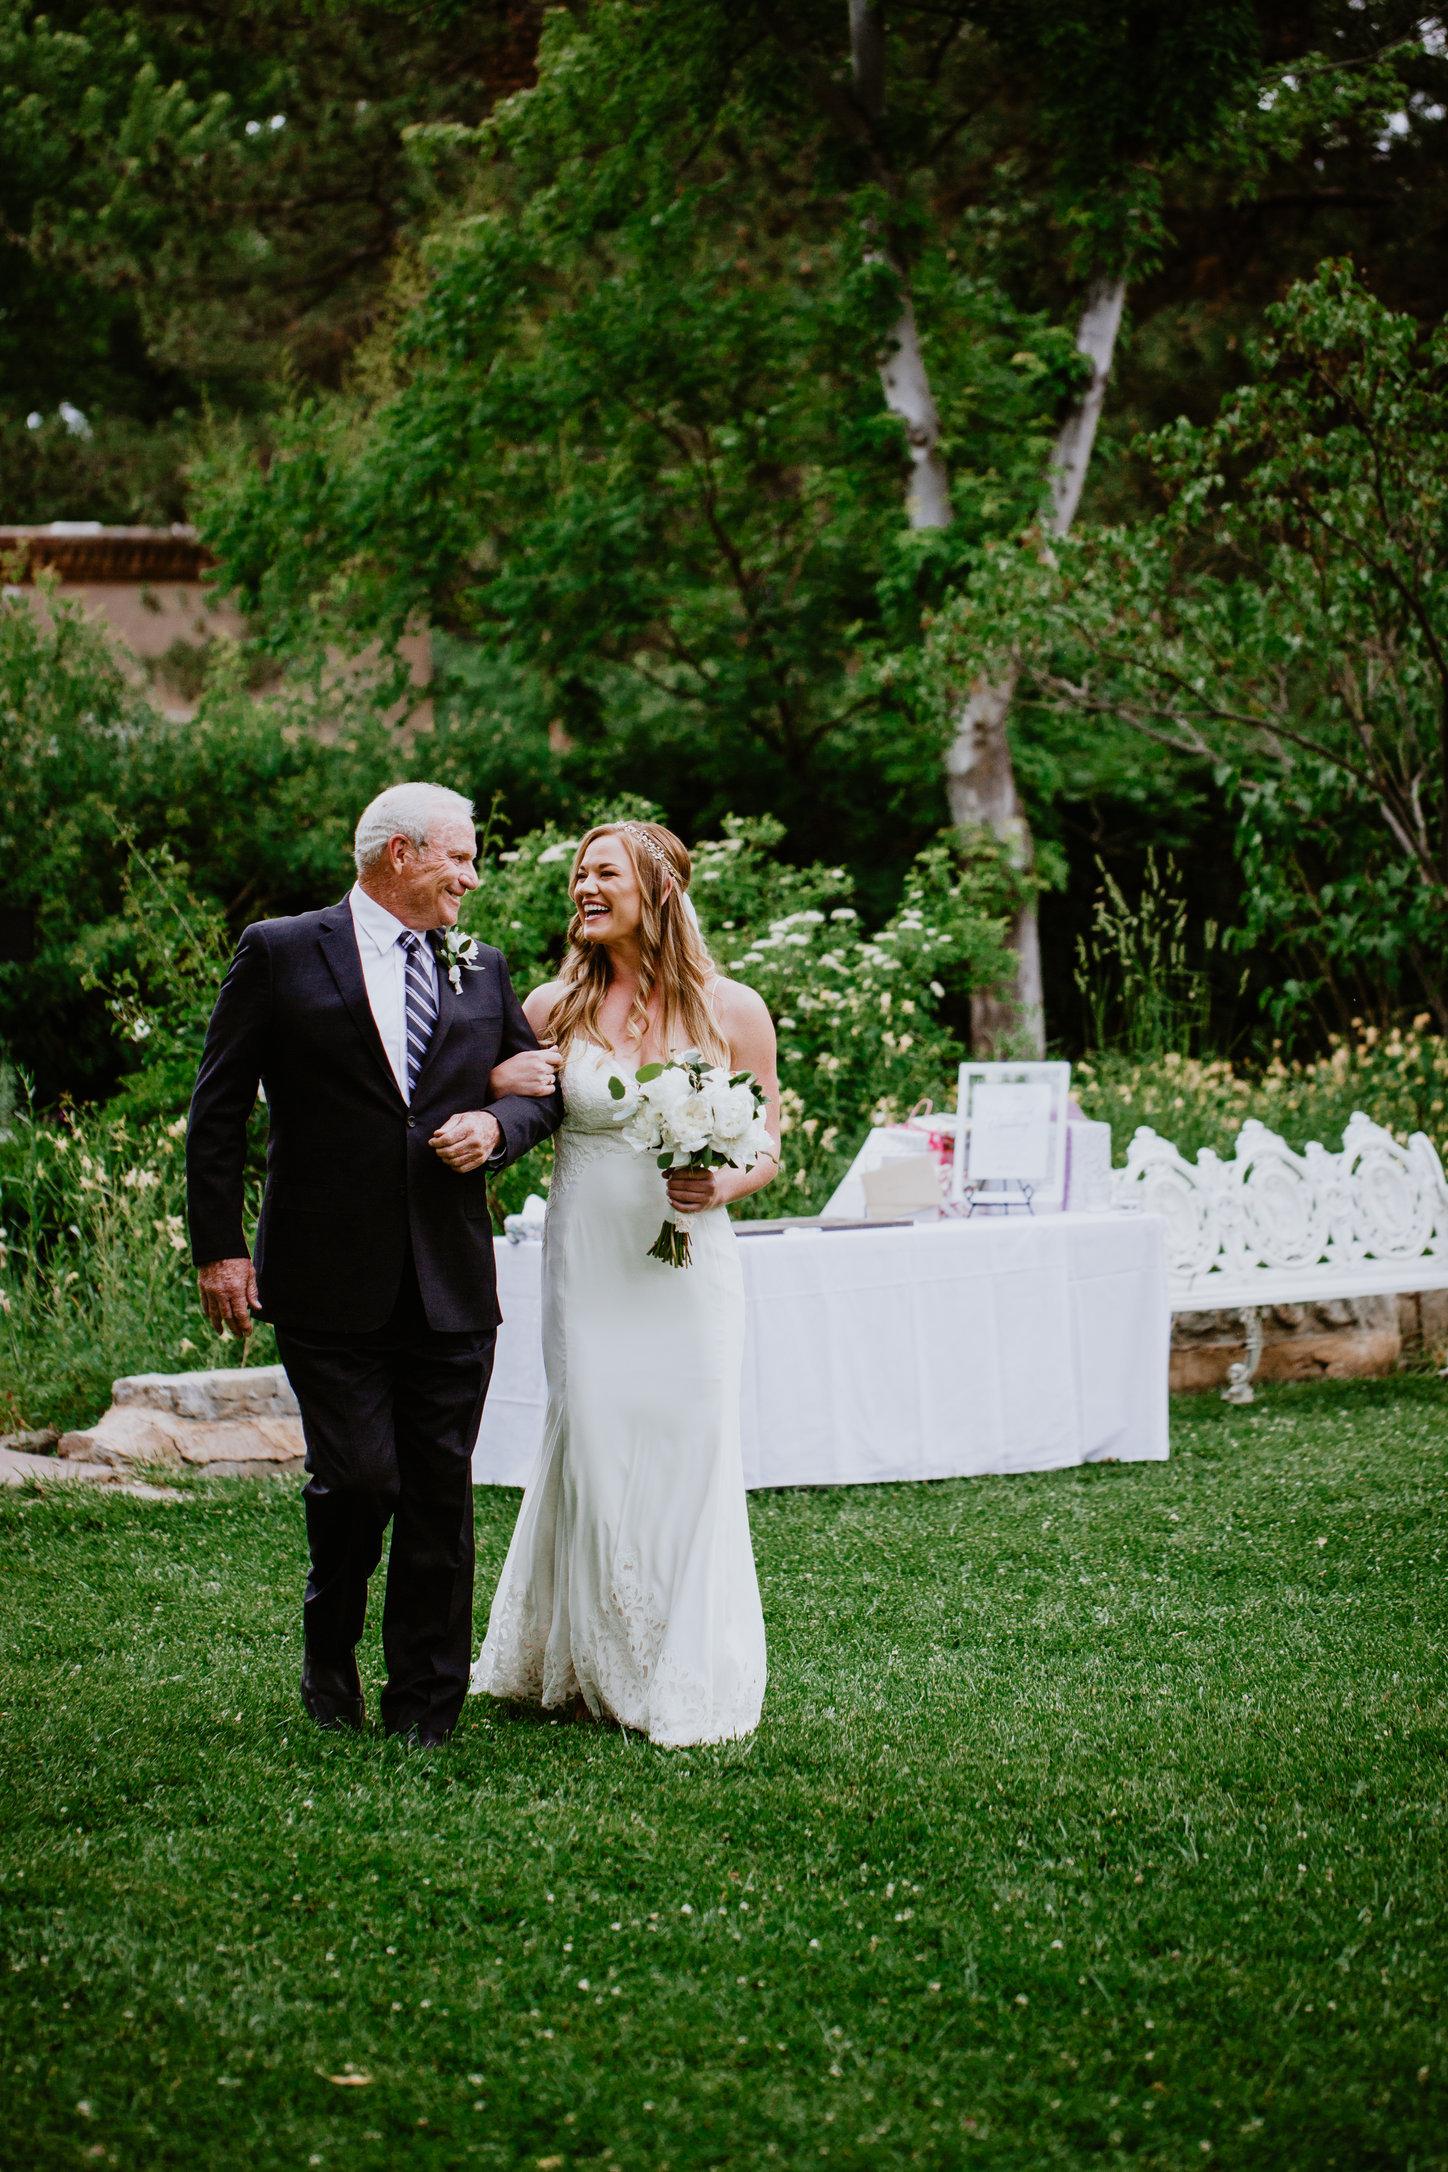 DandA-wedding-227.jpg